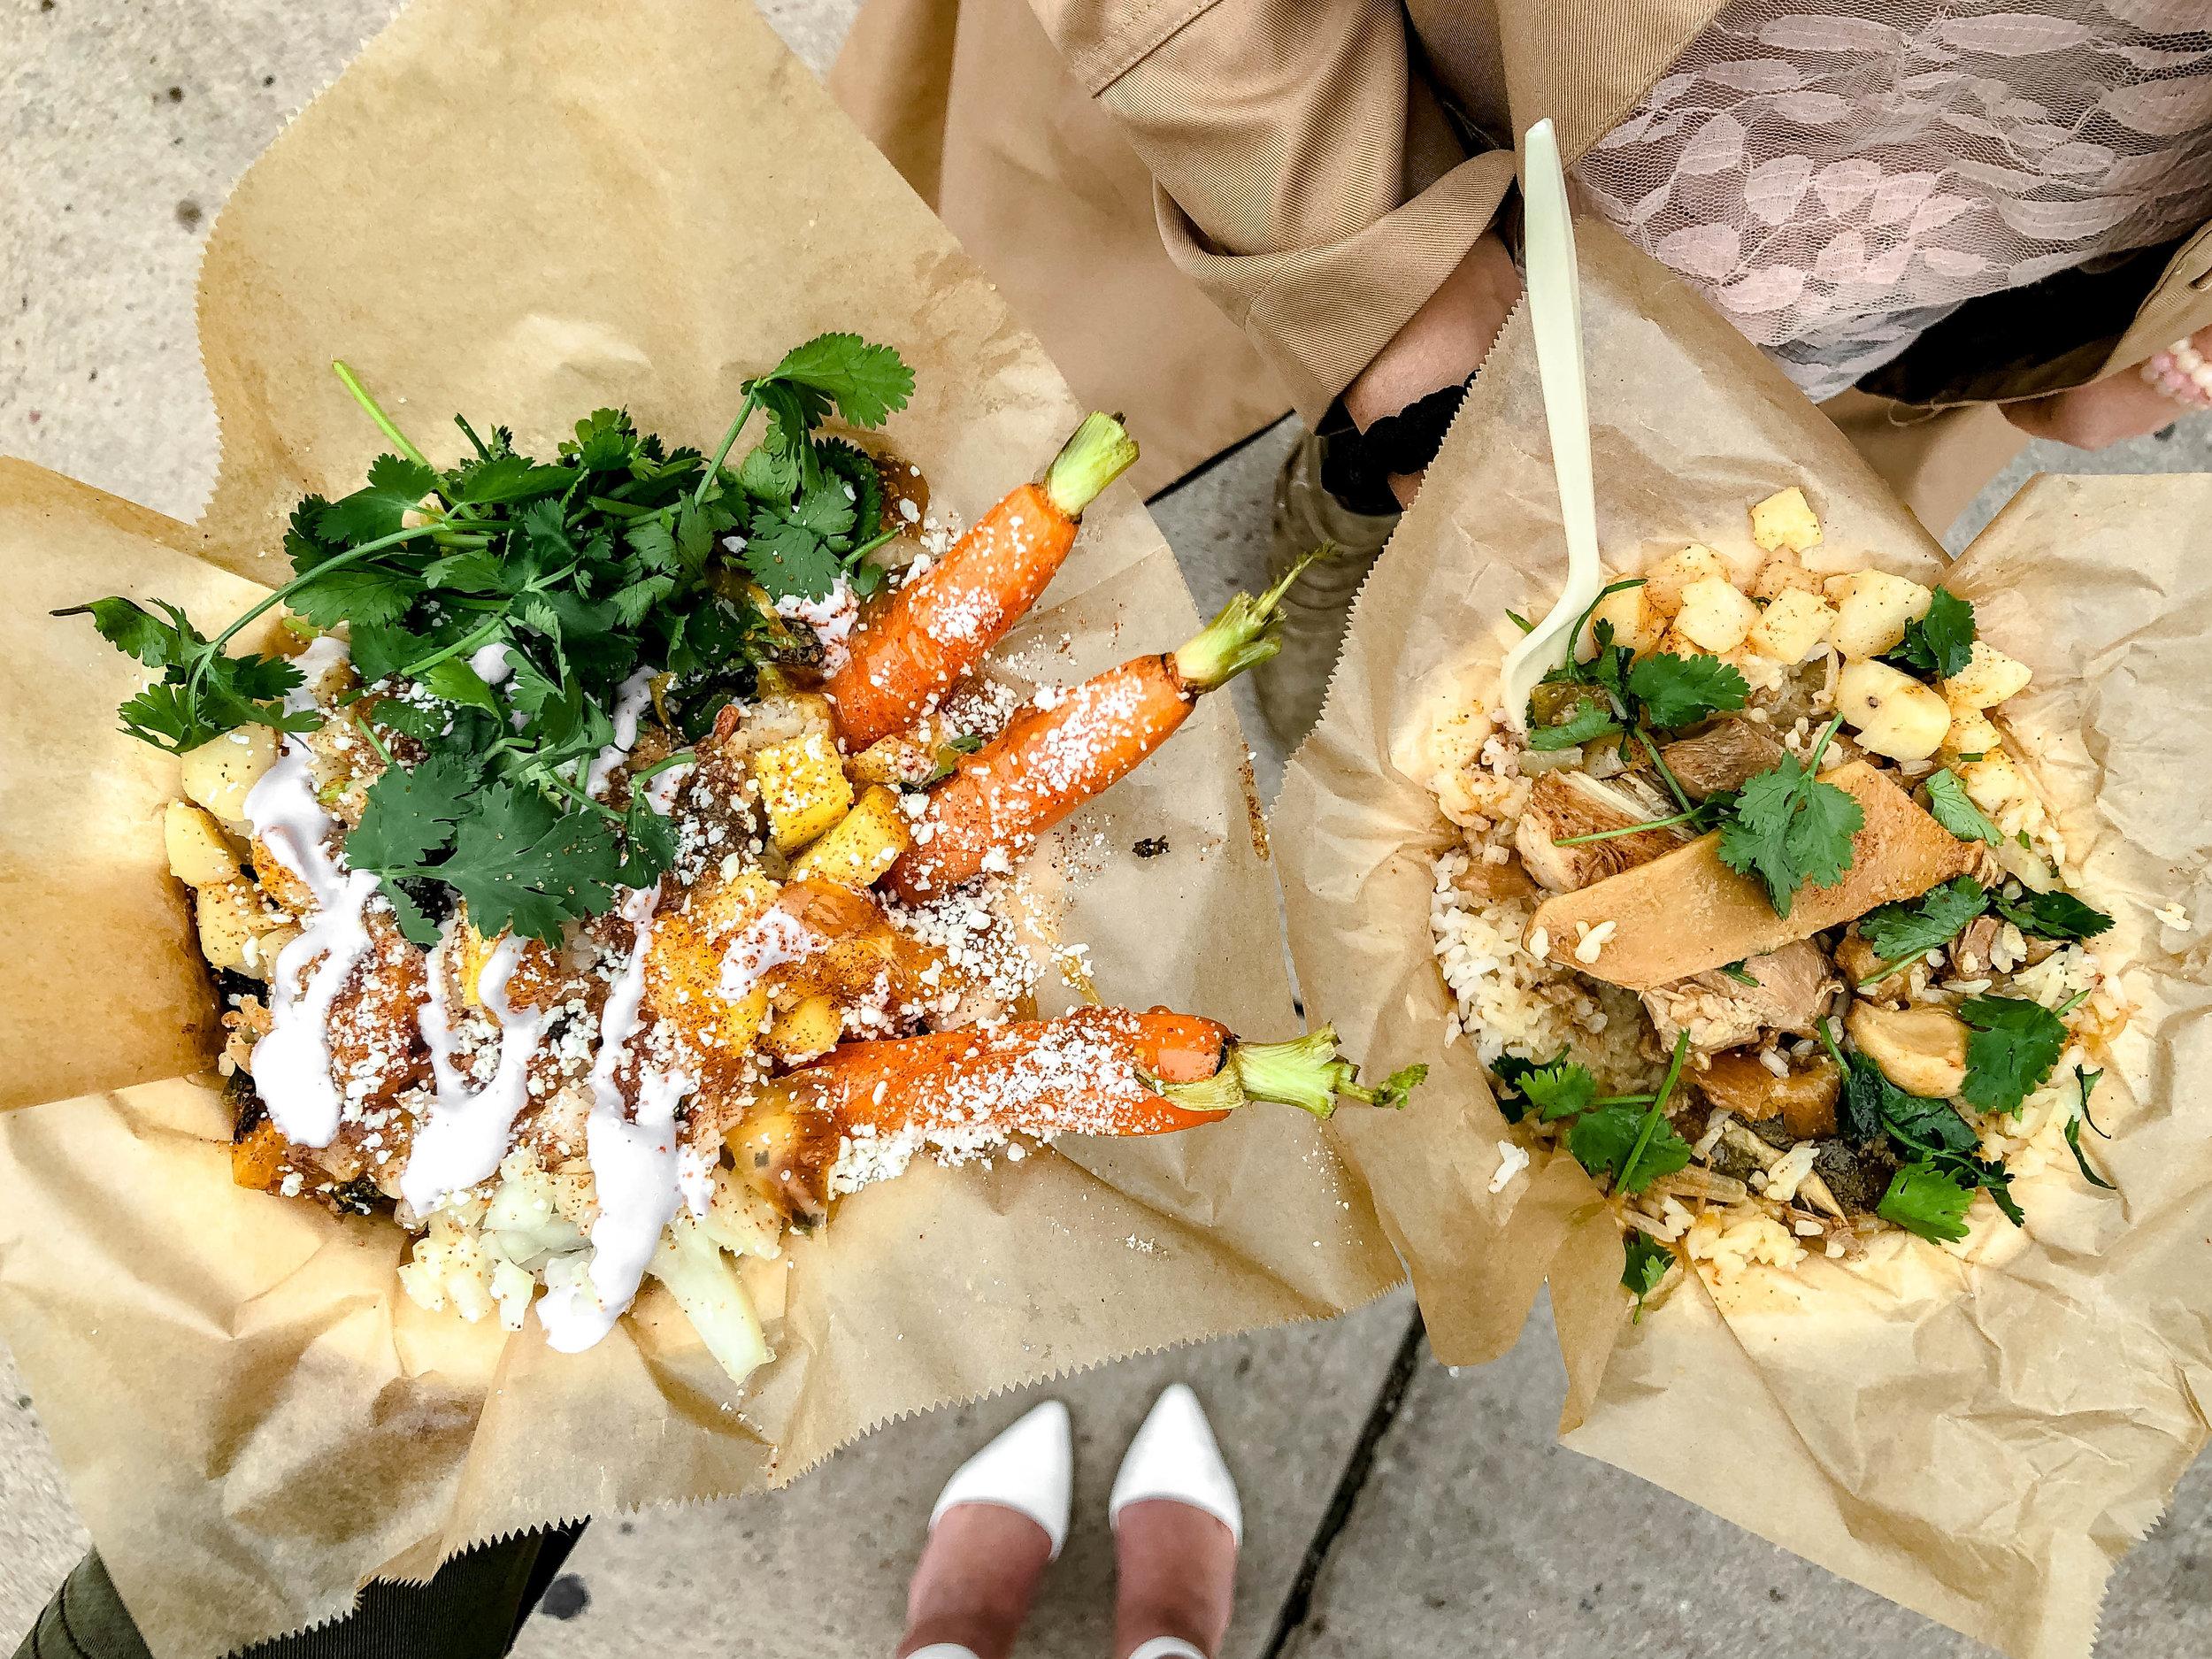 Veggie Stir Fry Taco Plate & Grandma's Filipino Chicken Adobo Rice Bowl by Adobo